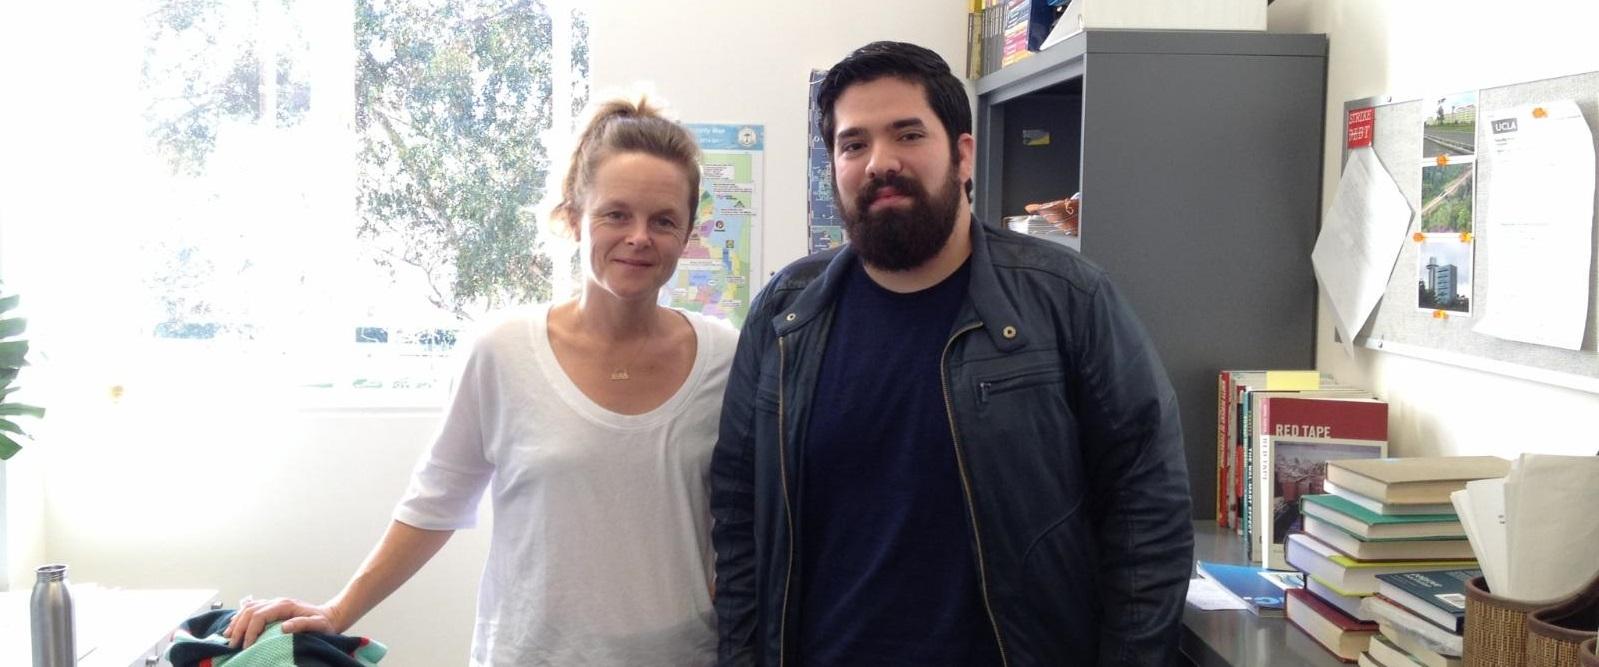 URC-HASS Student Felipe Huicochea with Faculty Mentor Hannah Appel